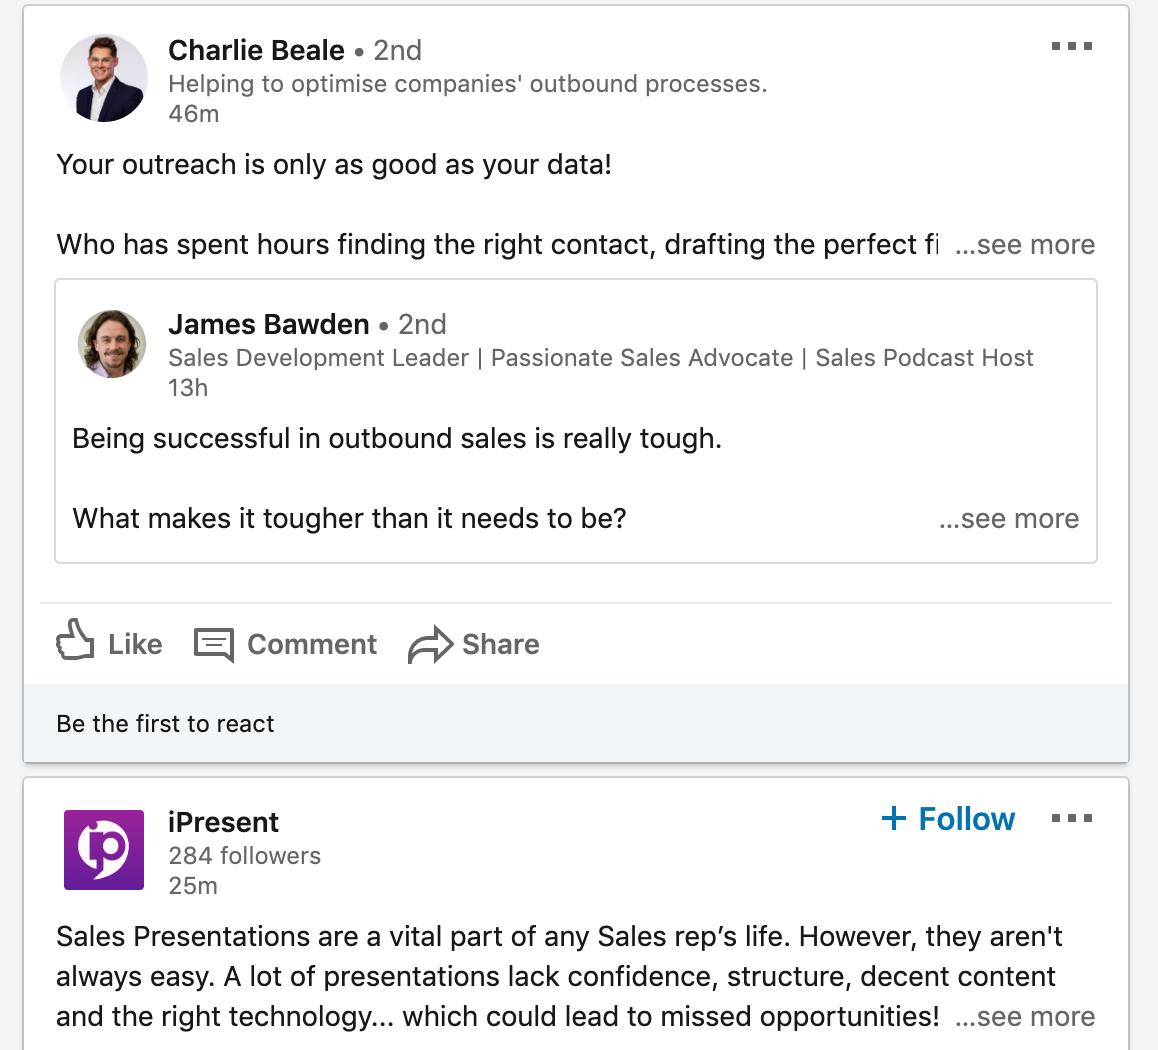 LinkedIn Sales App for Professionals